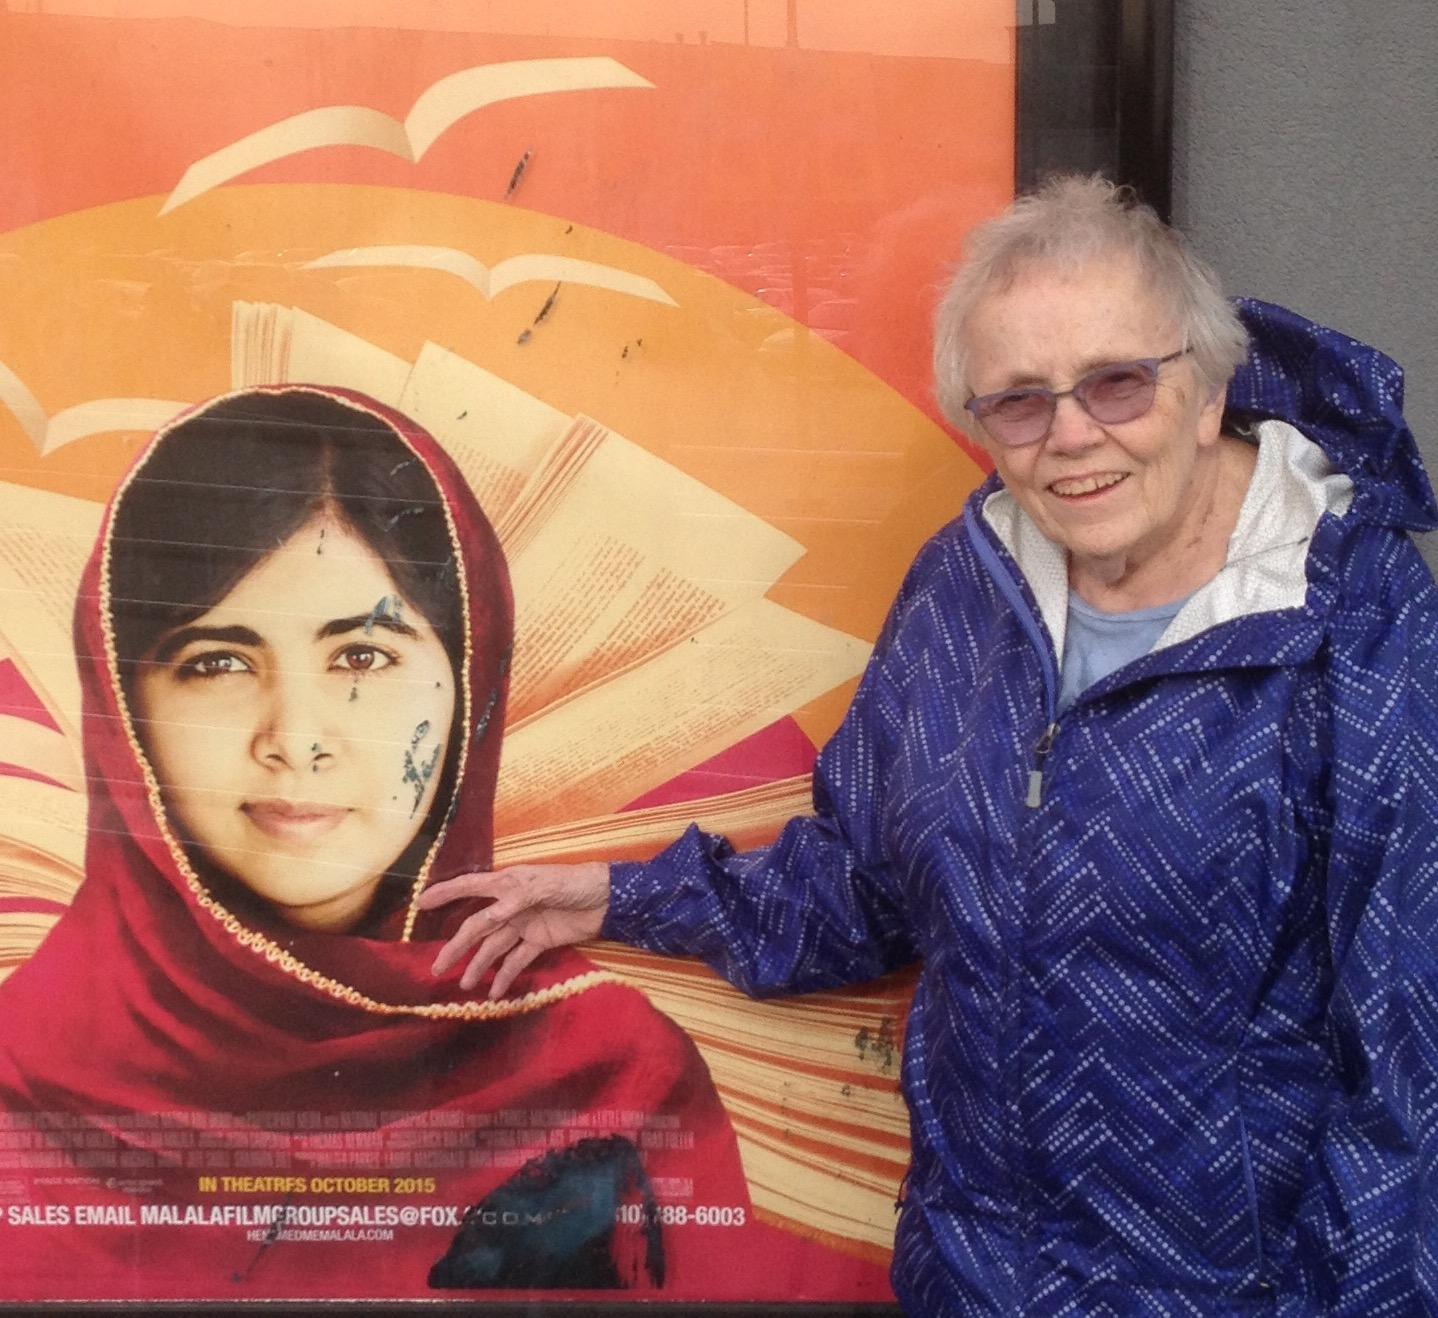 Mom and Malala